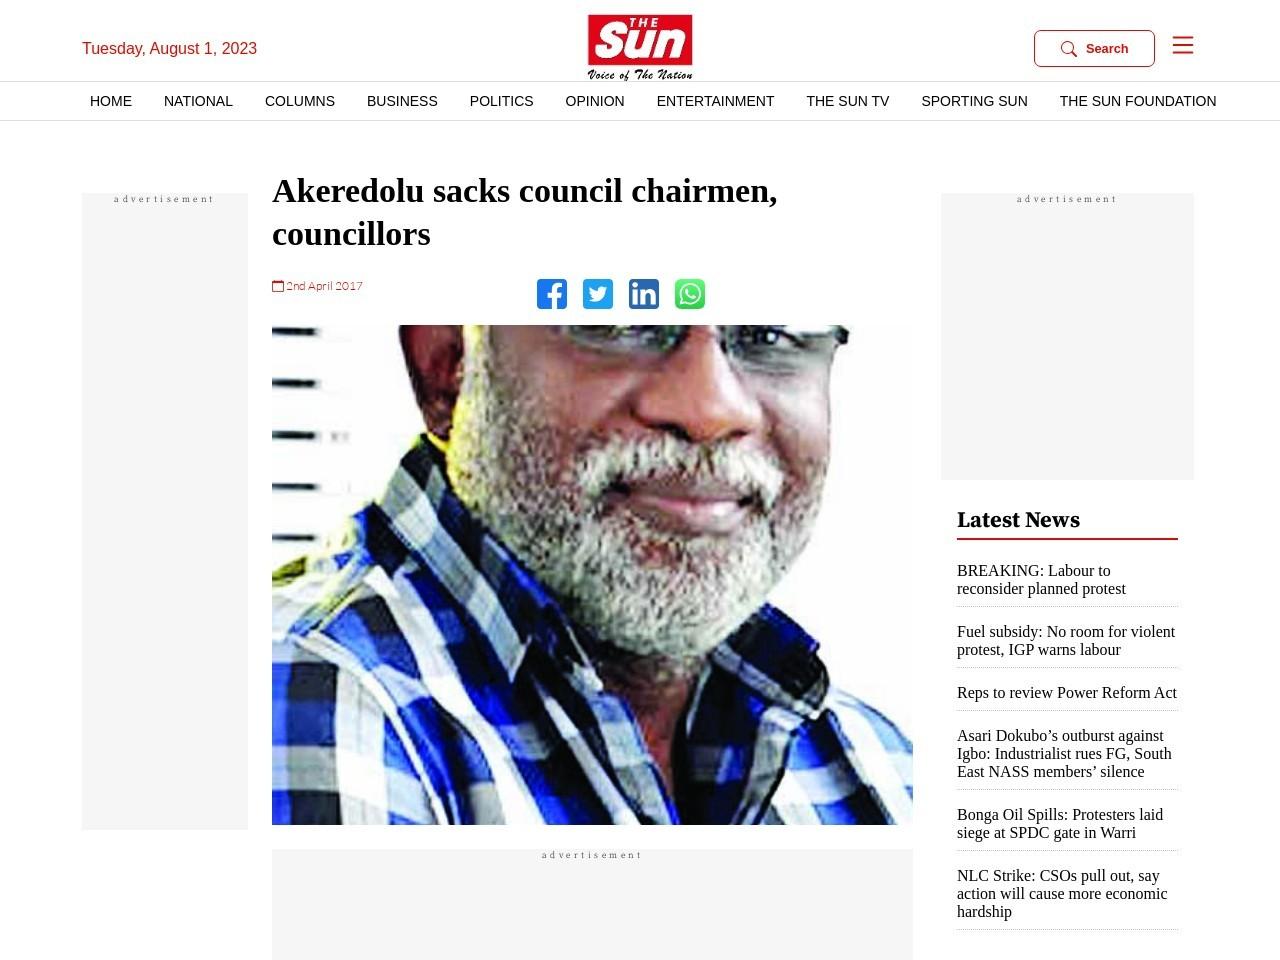 Akeredolu sacks council chairmen, councillors